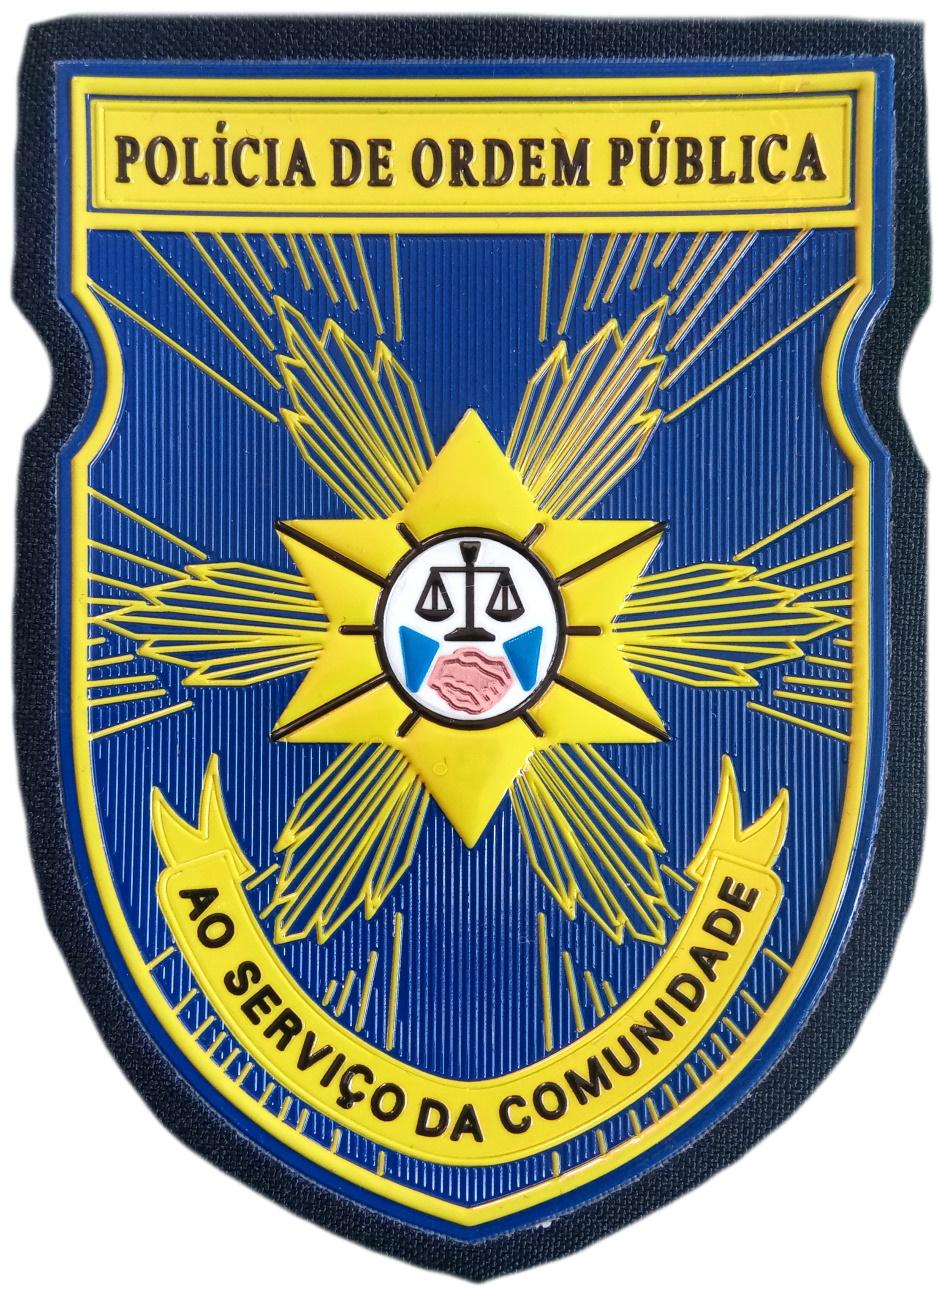 POLICÍA DE ORDEN PÚBLICO DE CABO VERDE PARCHE INSIGNIA EMBLEMA DISTINTIVO